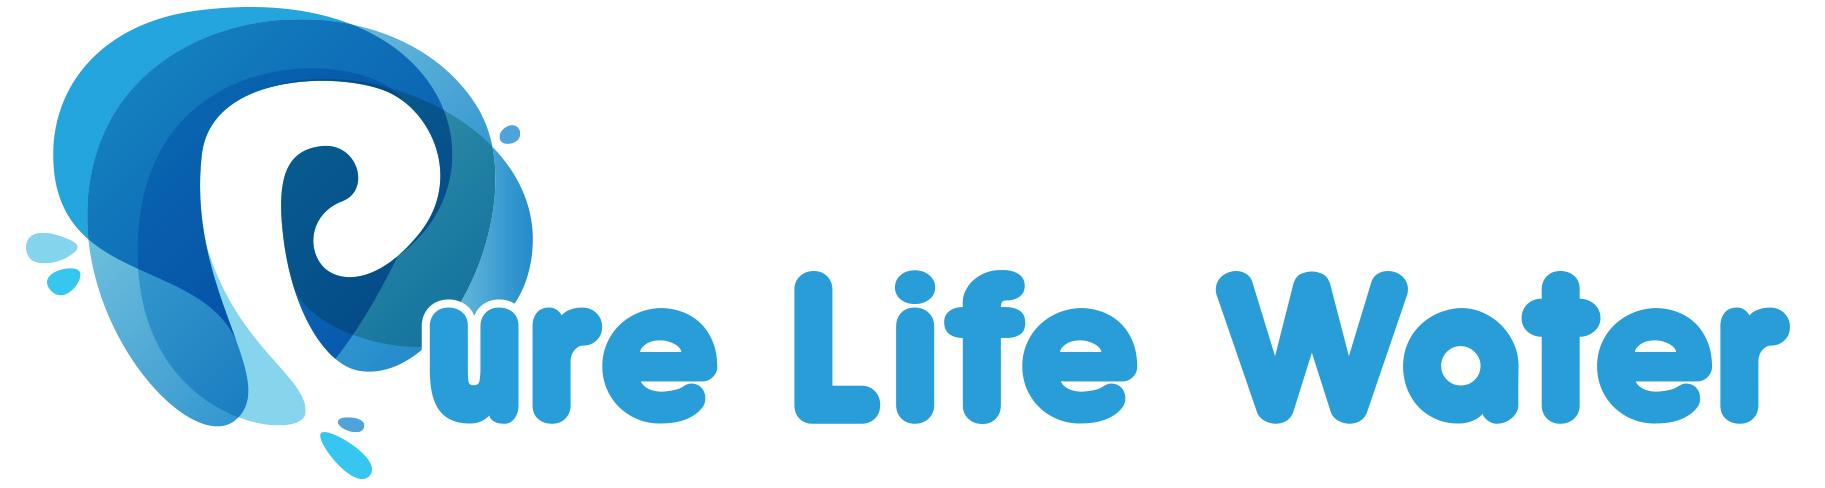 pure-life-water-logo.jpg